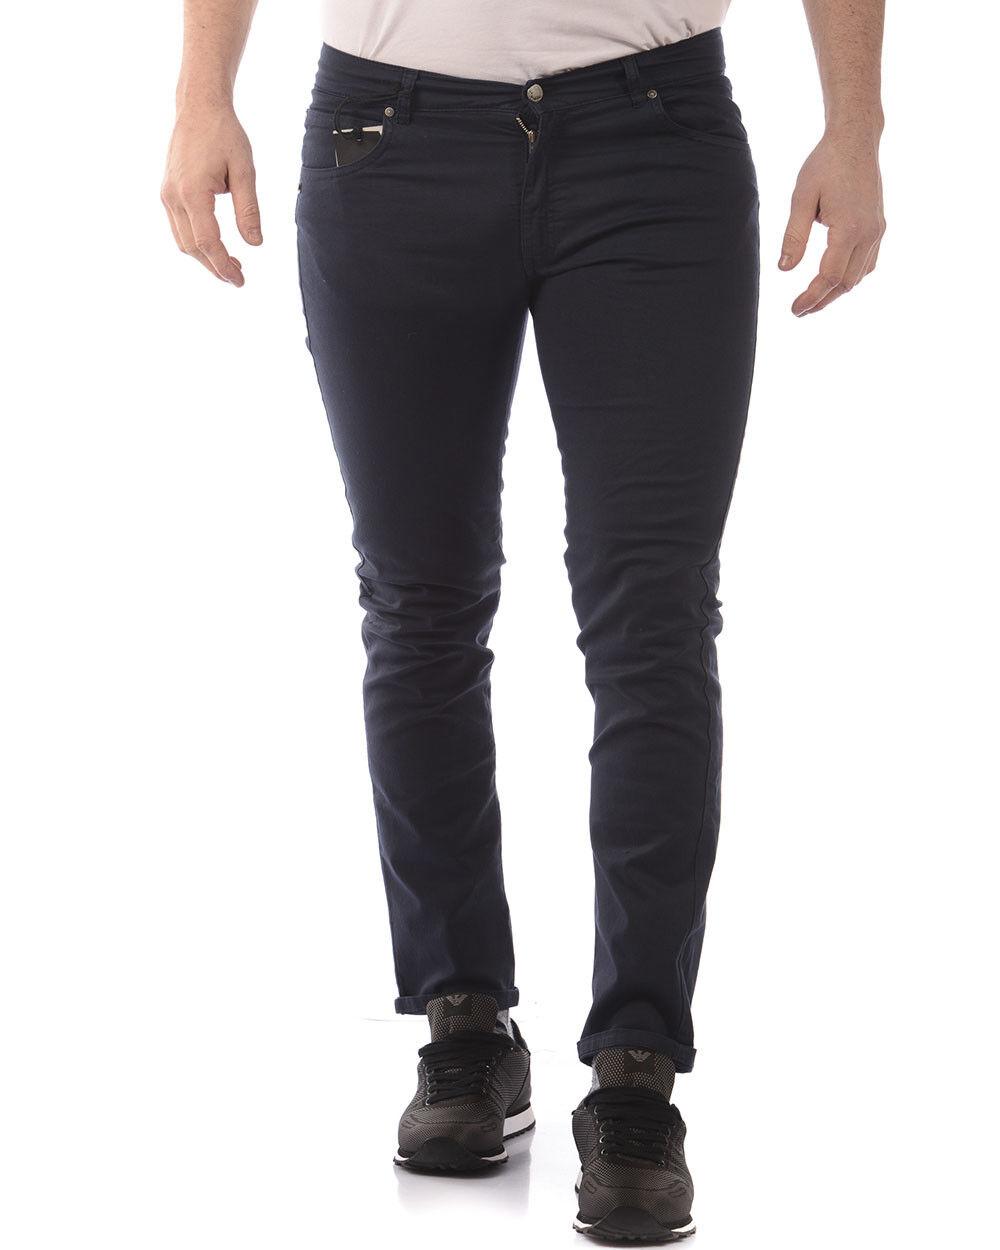 Pantaloni Daniele Alessandrini Jeans Trouser Cotone Uomo Blu PJ5385L1003700 23